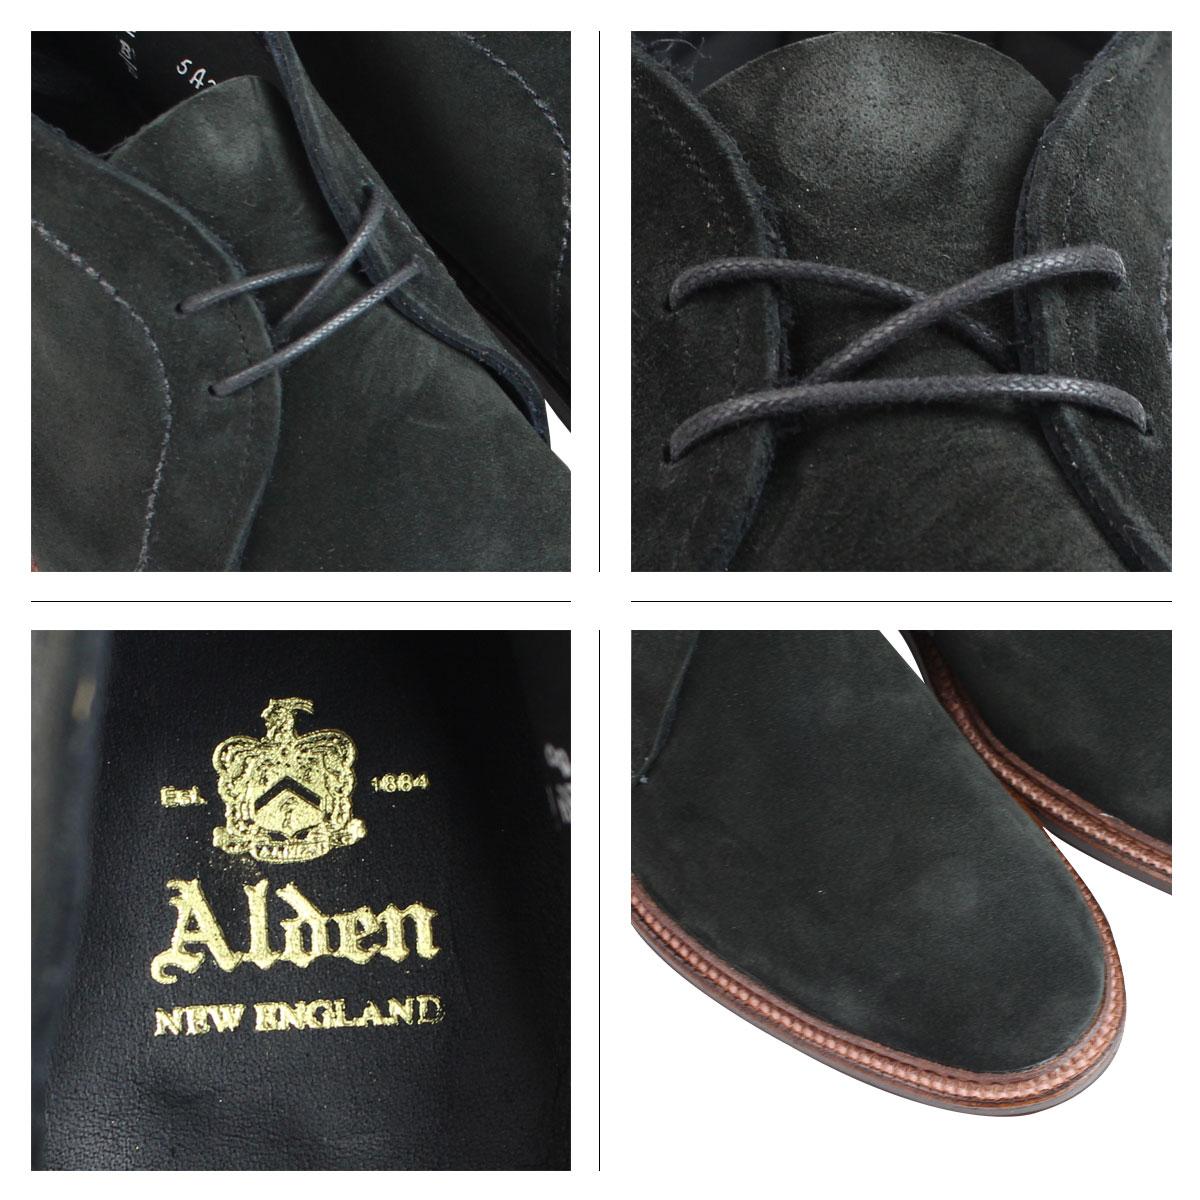 Alden ALDEN chukka boot UNLINED CHUKKA D wise 1497 men